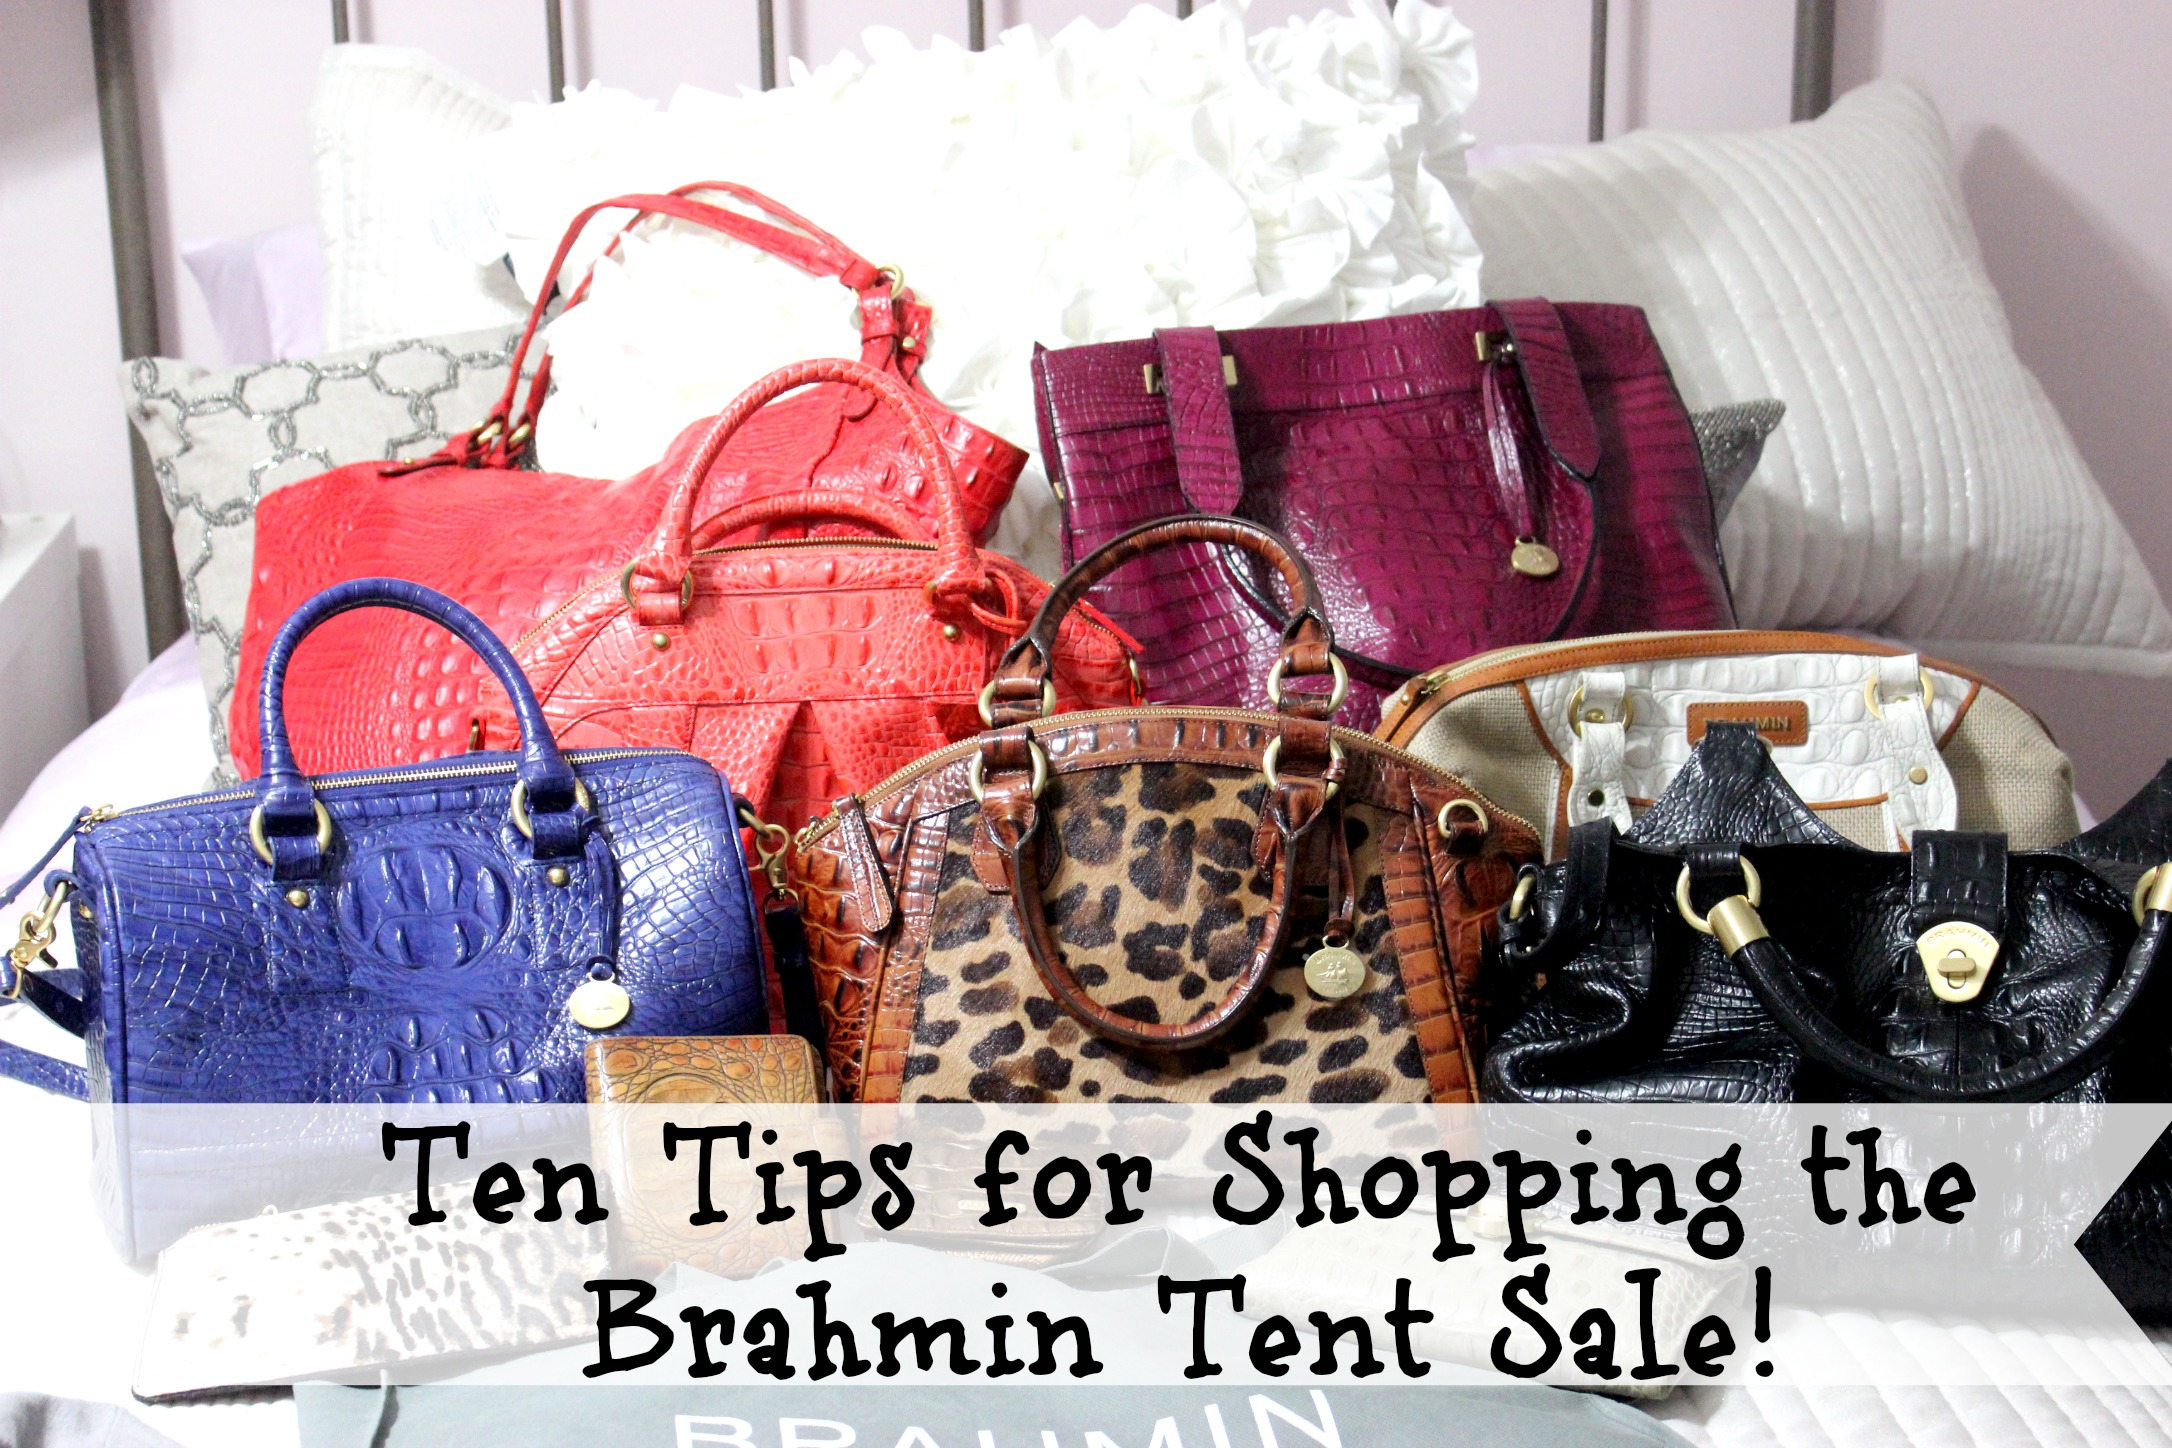 b91d0f93da4 Updated* Ten Tips for Shopping the Brahmin Tent Sale - www ...